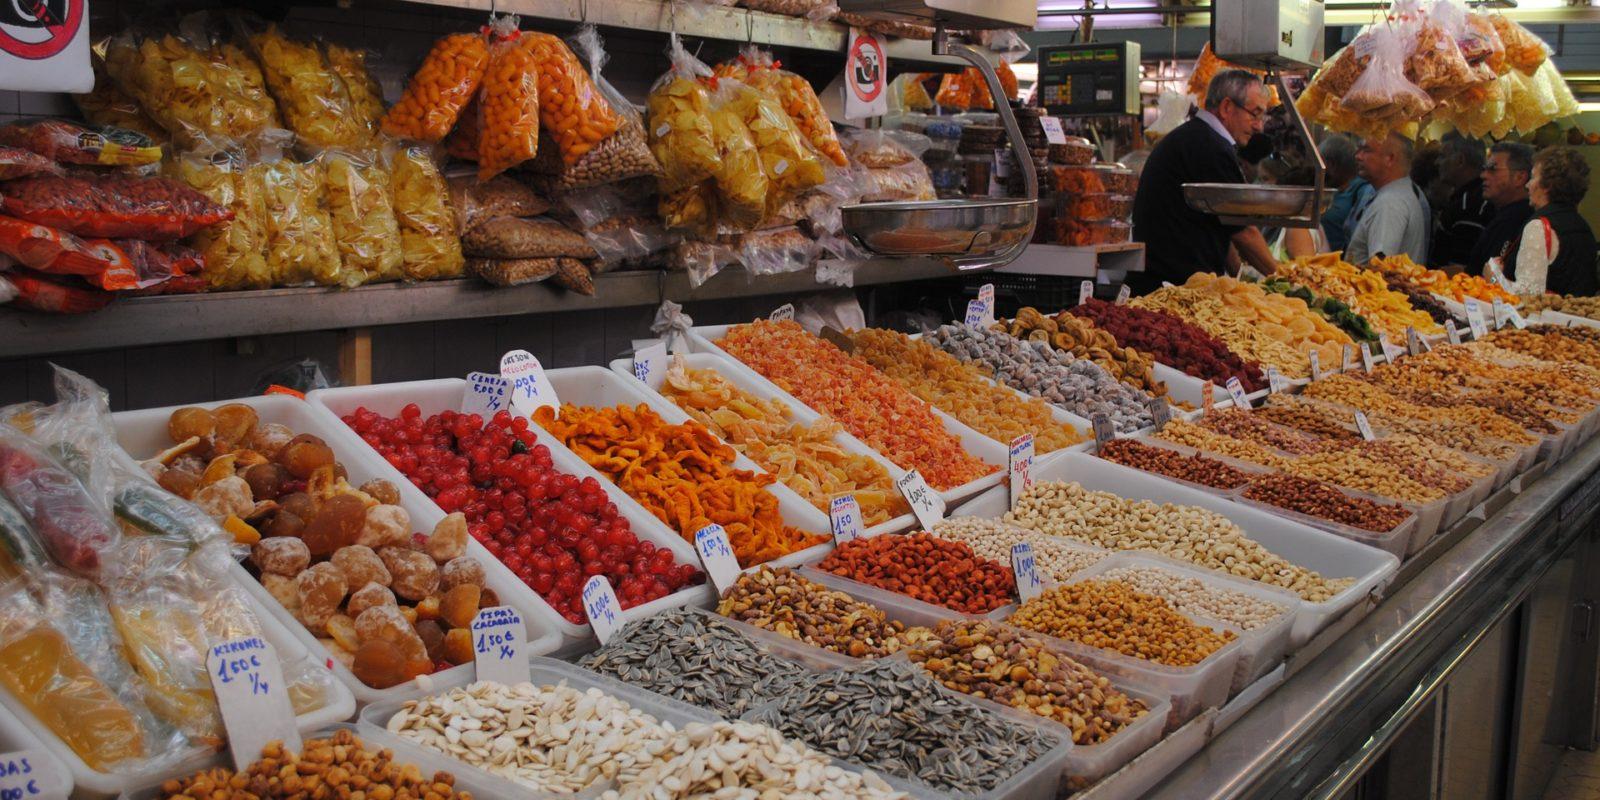 Spice Market, Valencia, SPAIN